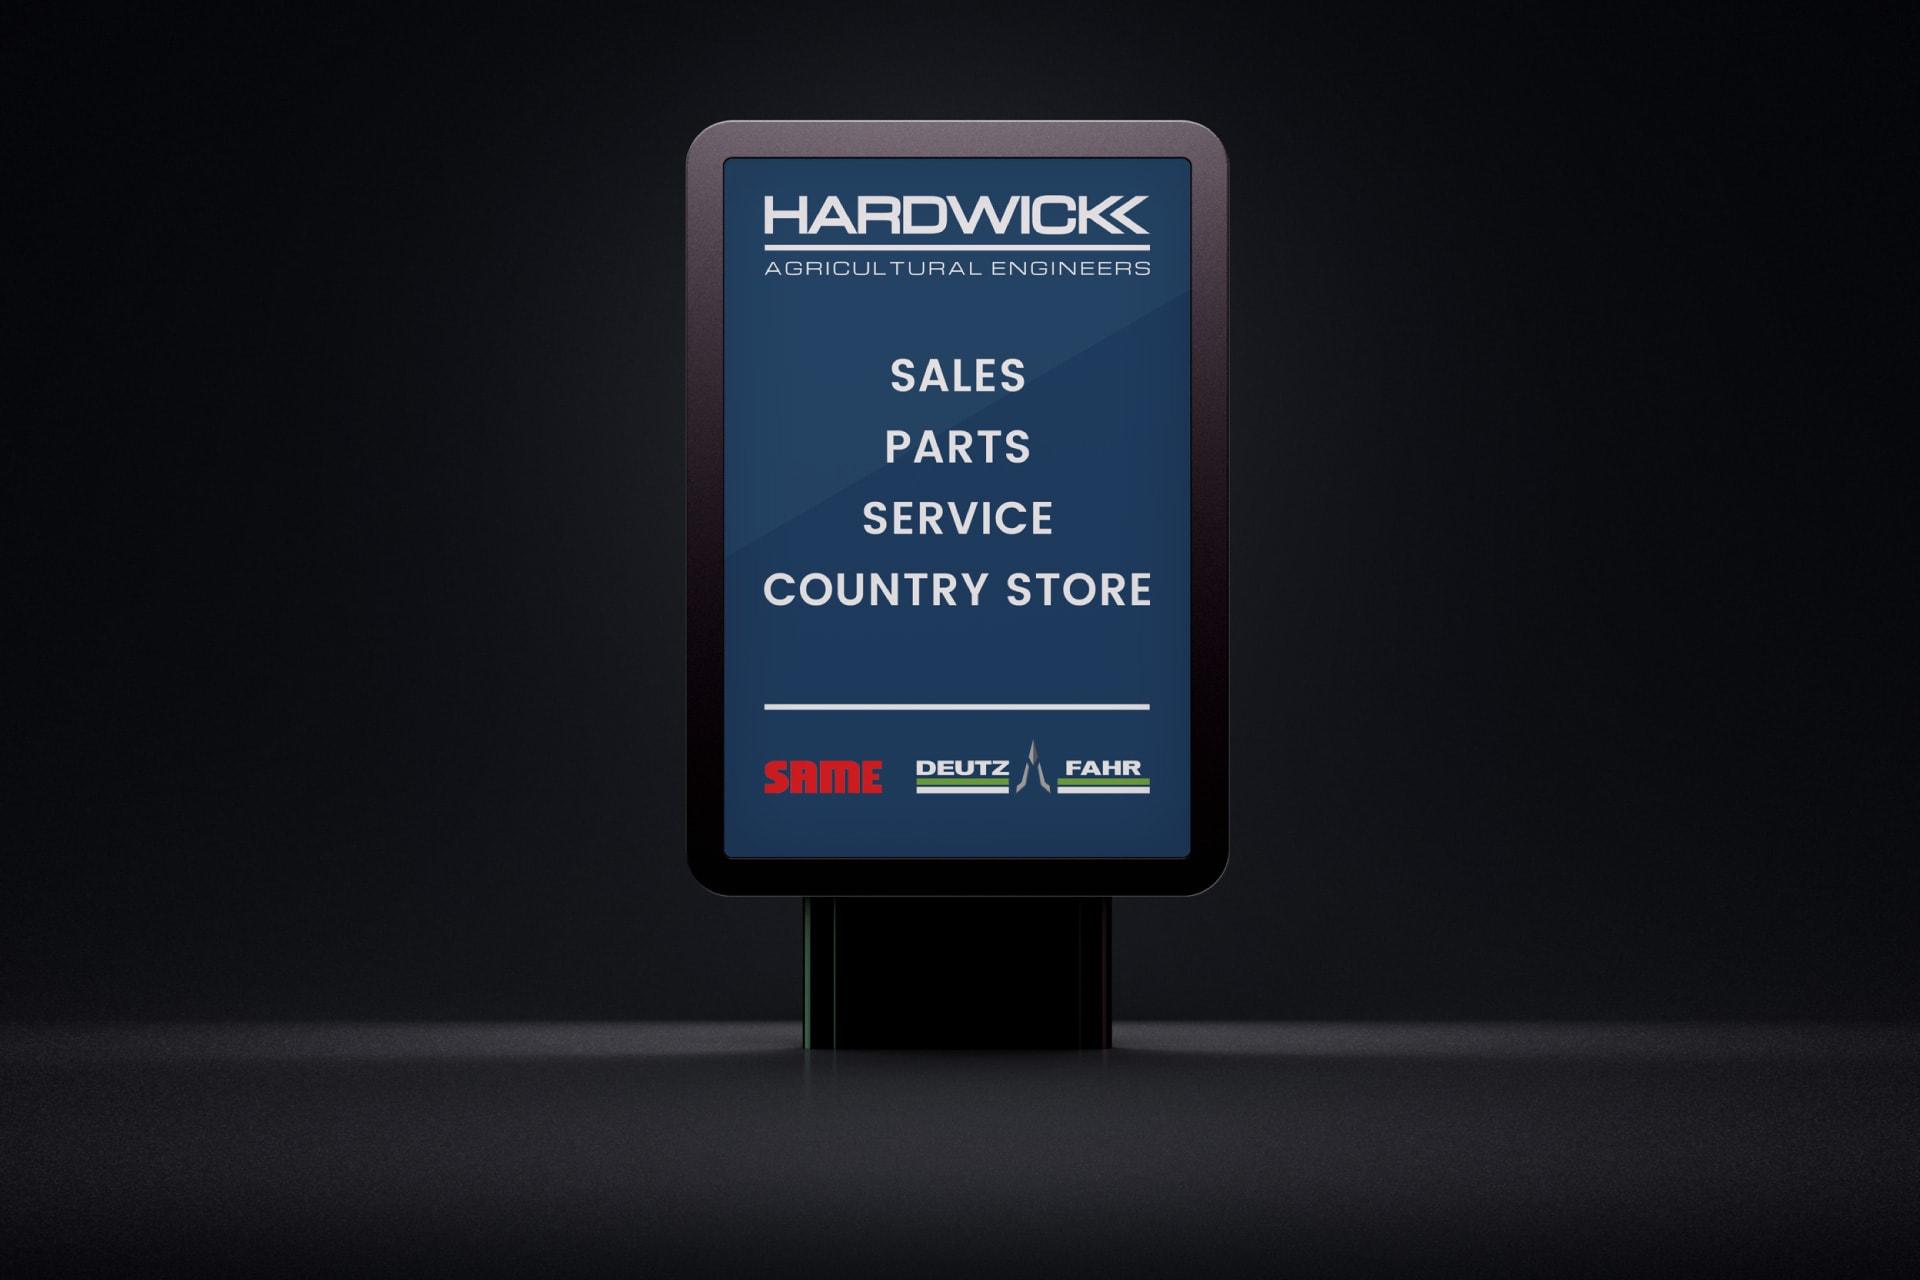 hardwick website pages